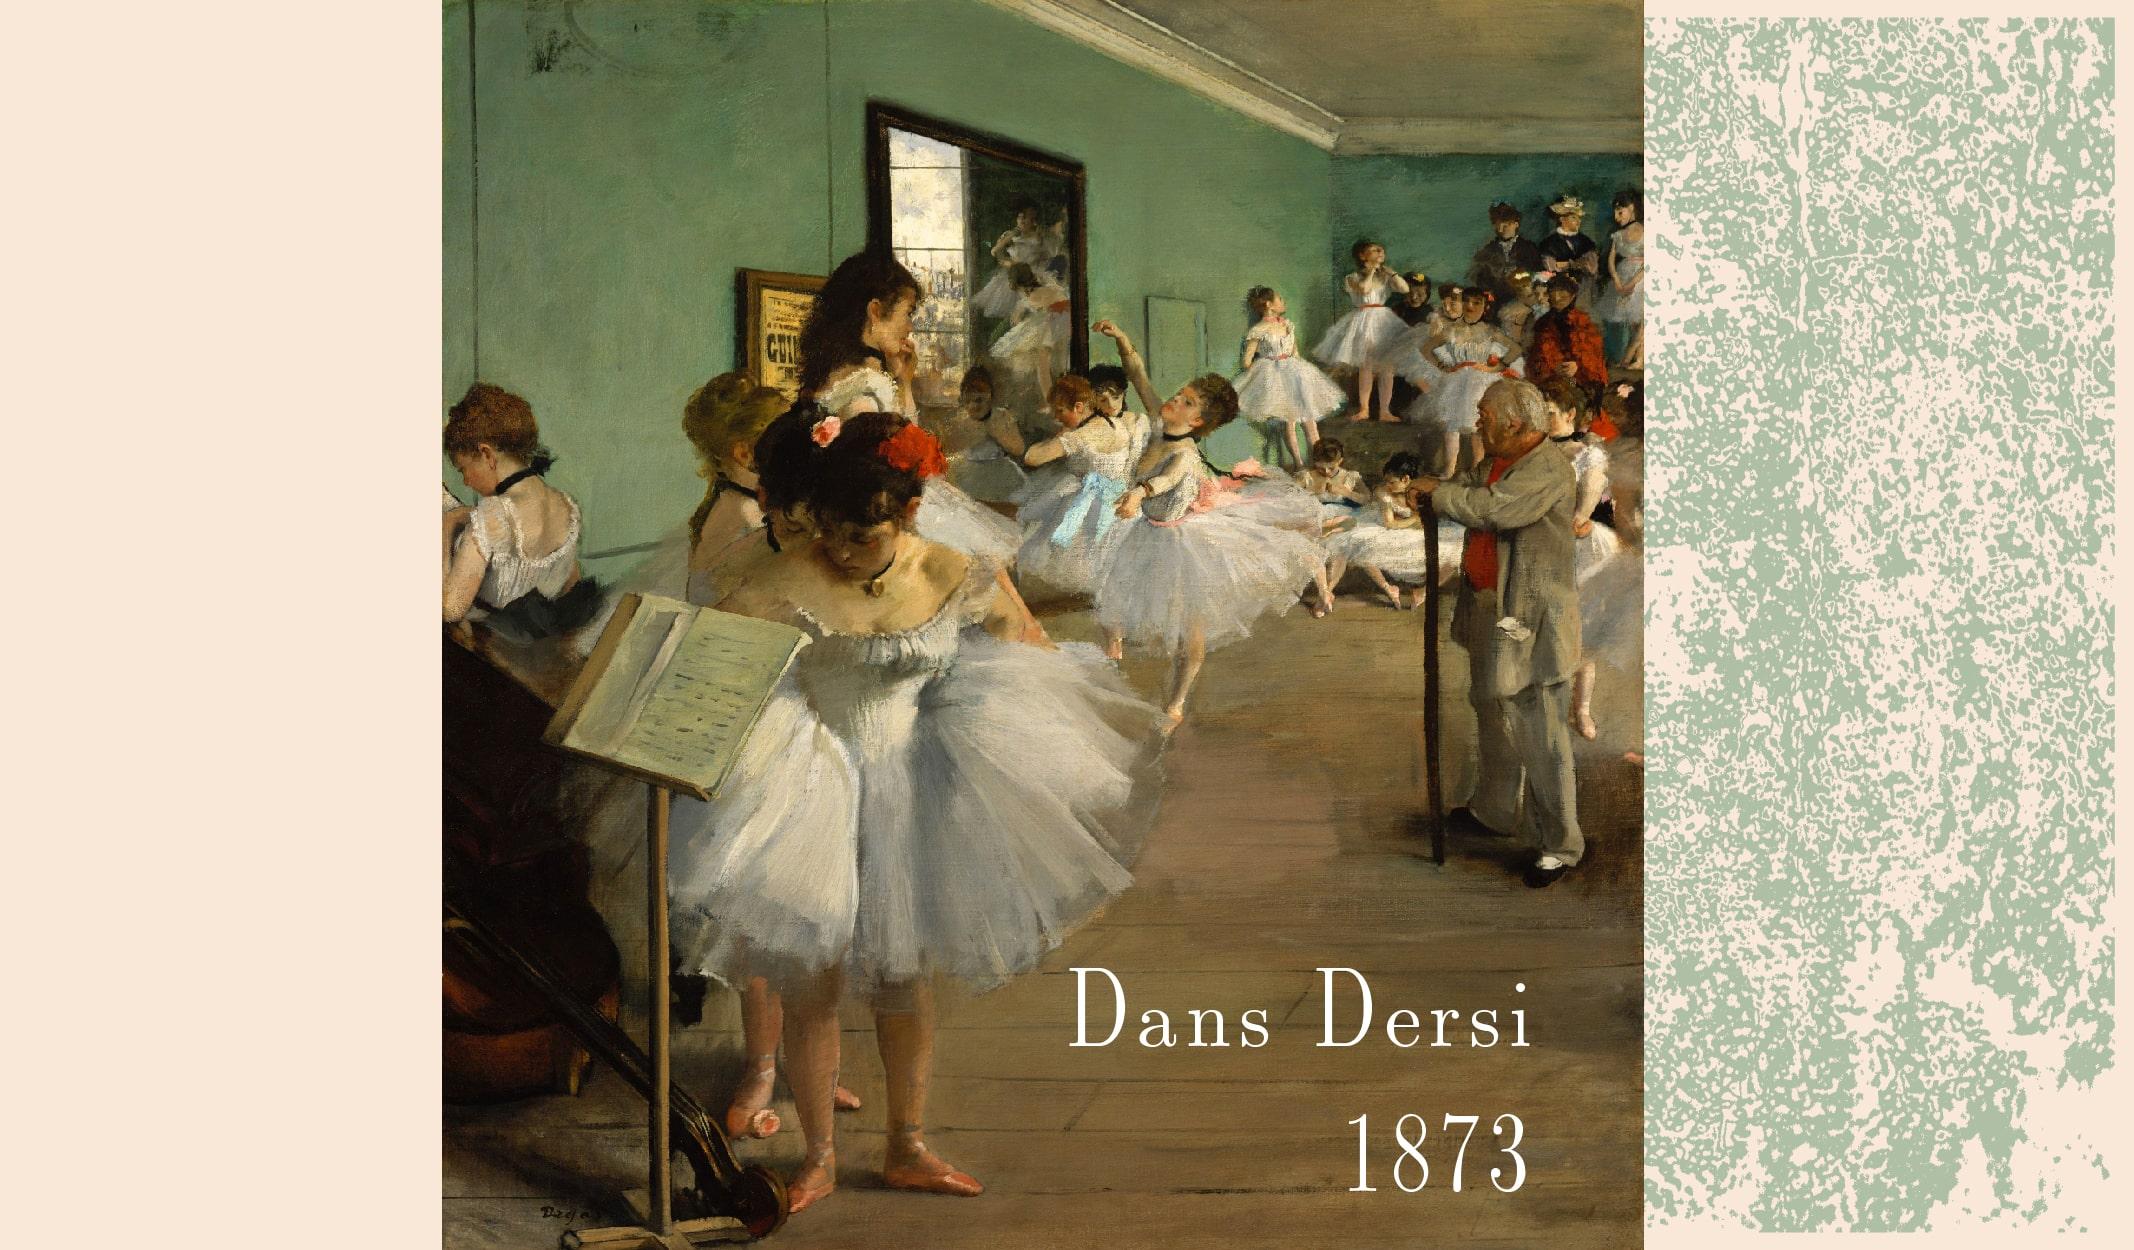 dans günü, ressam, resim